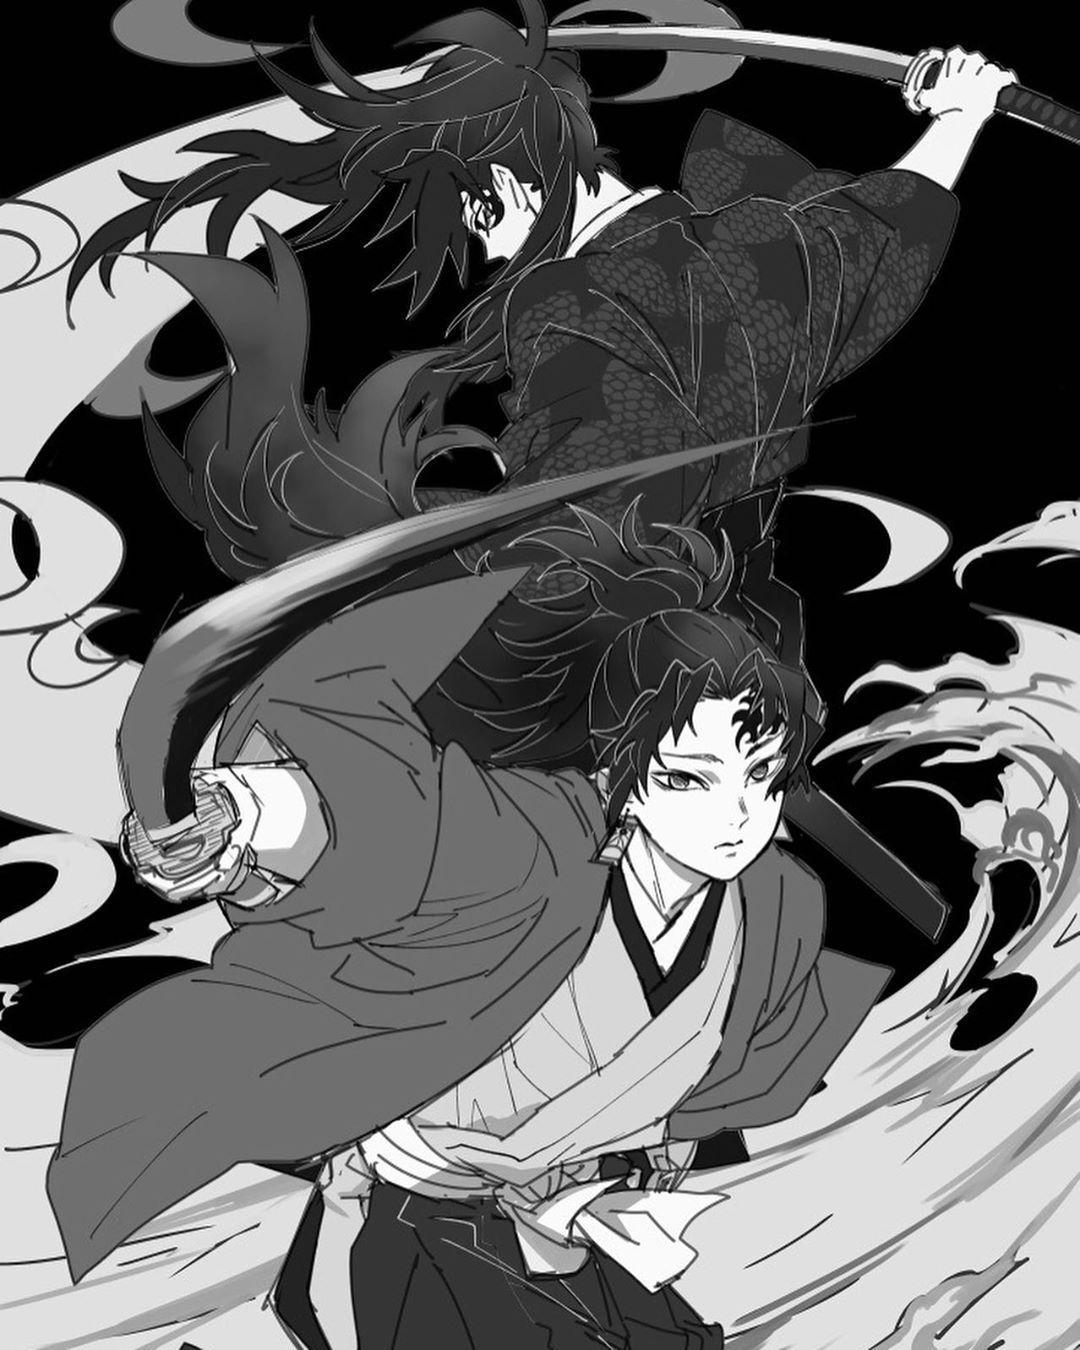 Demon Slayer Wallpaper Black And White Anime Wallpaper Hd The final chapter for koyoharu gotouge's demon slayer: